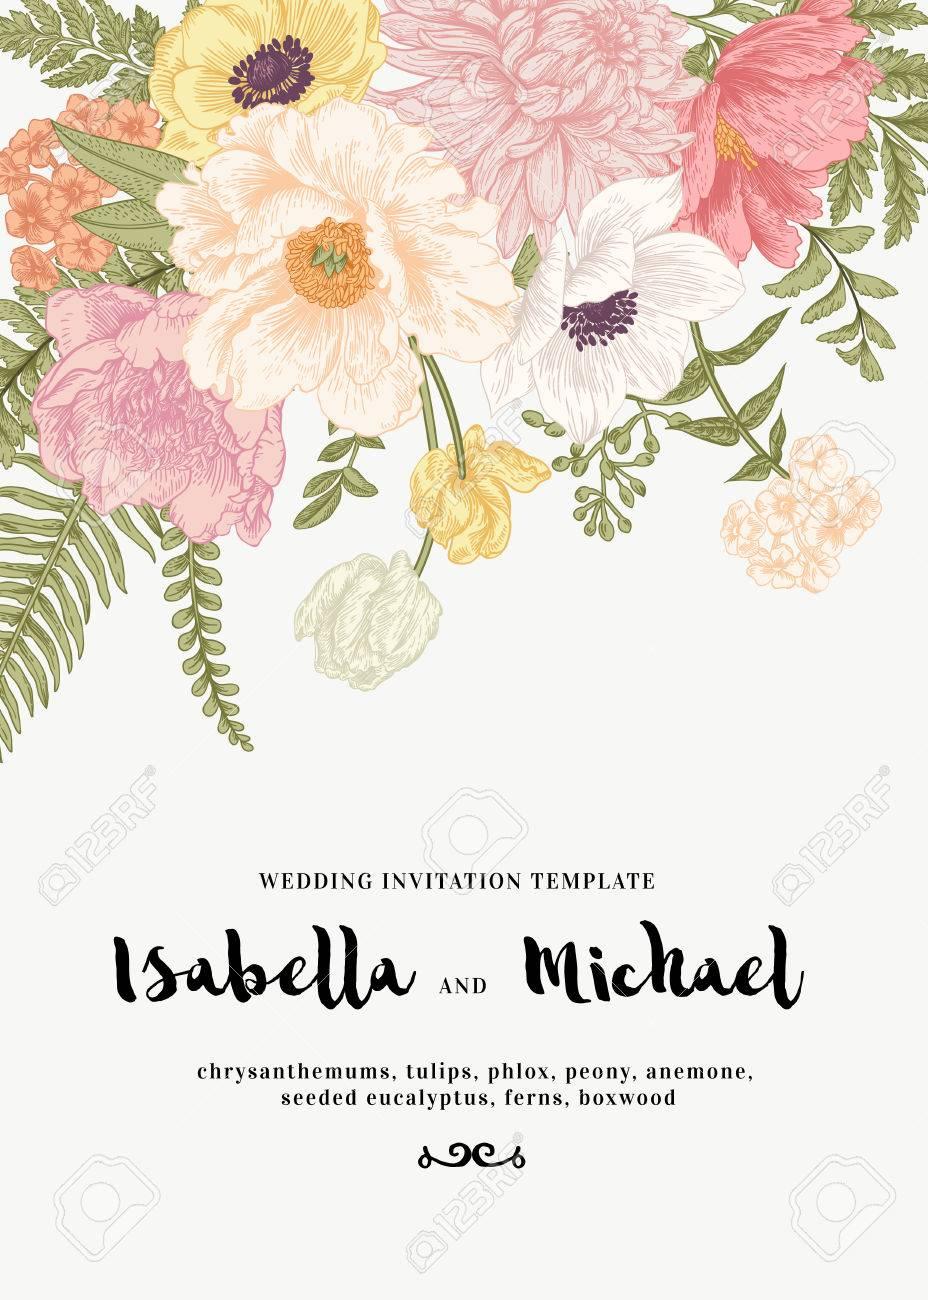 Elegant wedding invitation with summer flowers in vintage style. Chrysanthemums, tulips, phlox, peony, anemone, ferns. Pastel colors. - 63418914